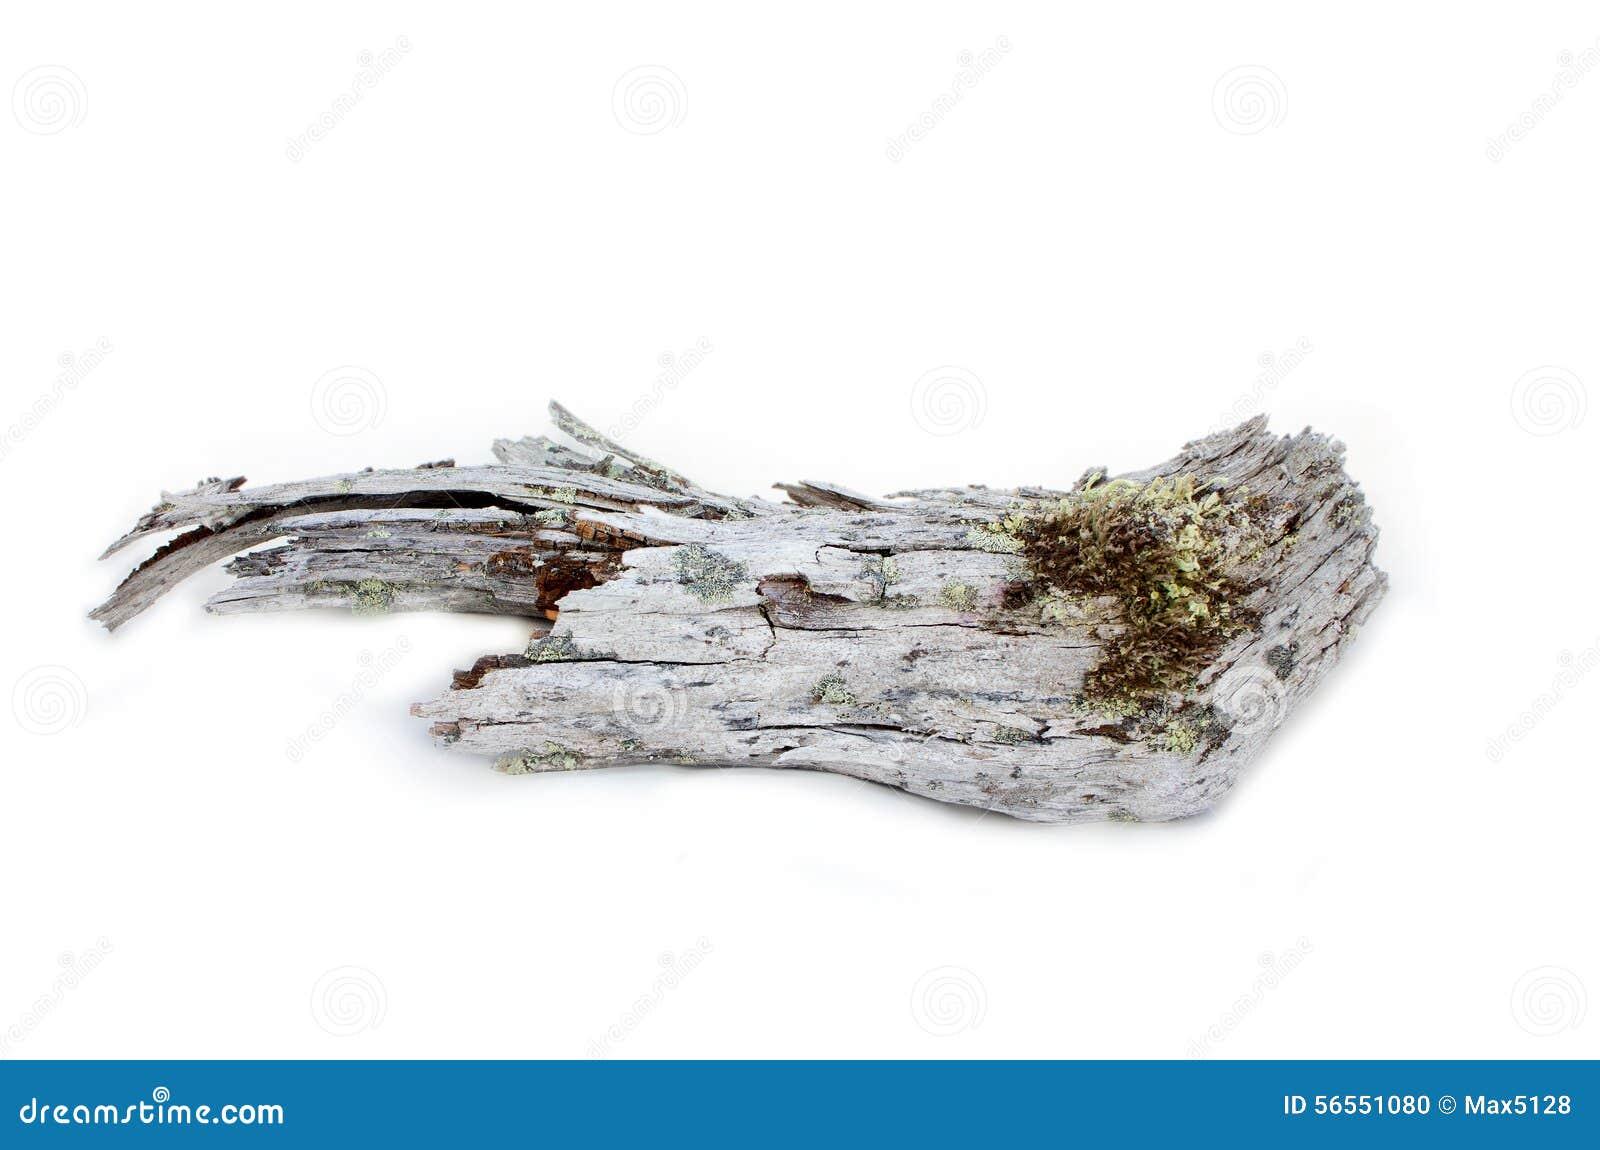 Download Το ξύλο είναι πολύ παλαιό στο άσπρο υπόβαθρο Στοκ Εικόνες - εικόνα από γη, φυσικός: 56551080